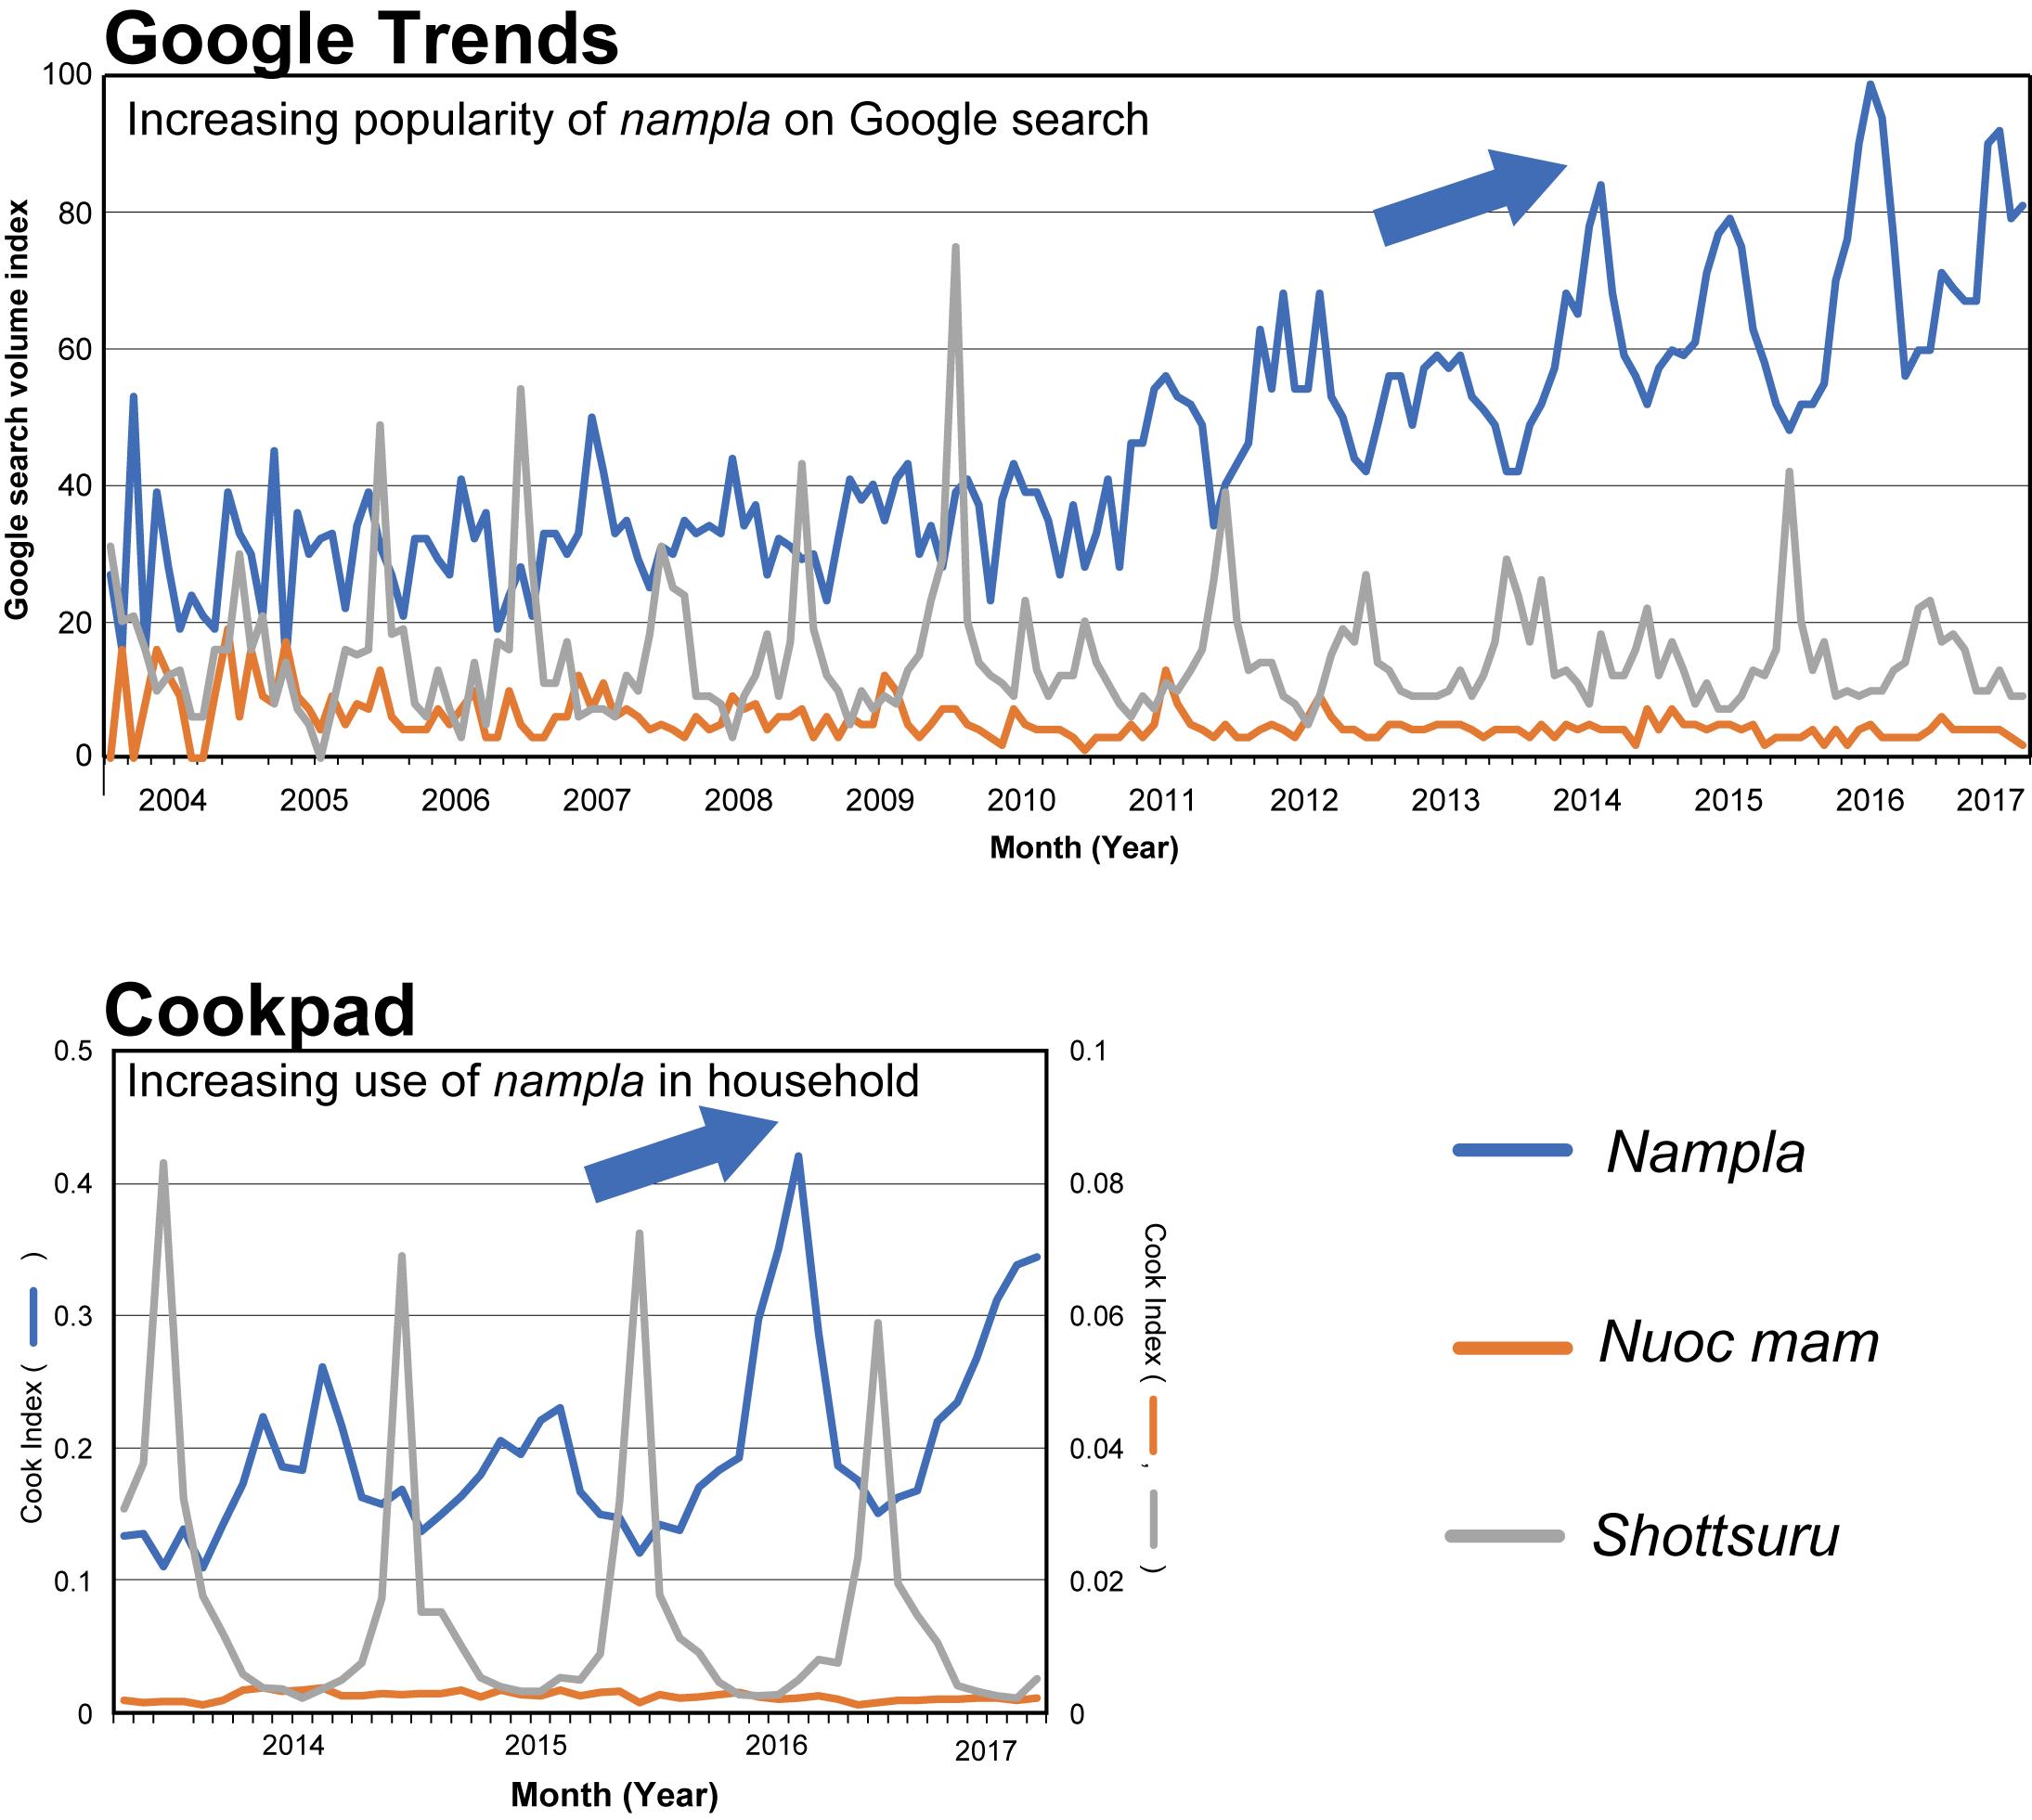 Webデータマイニングによる食品の利用動向解析